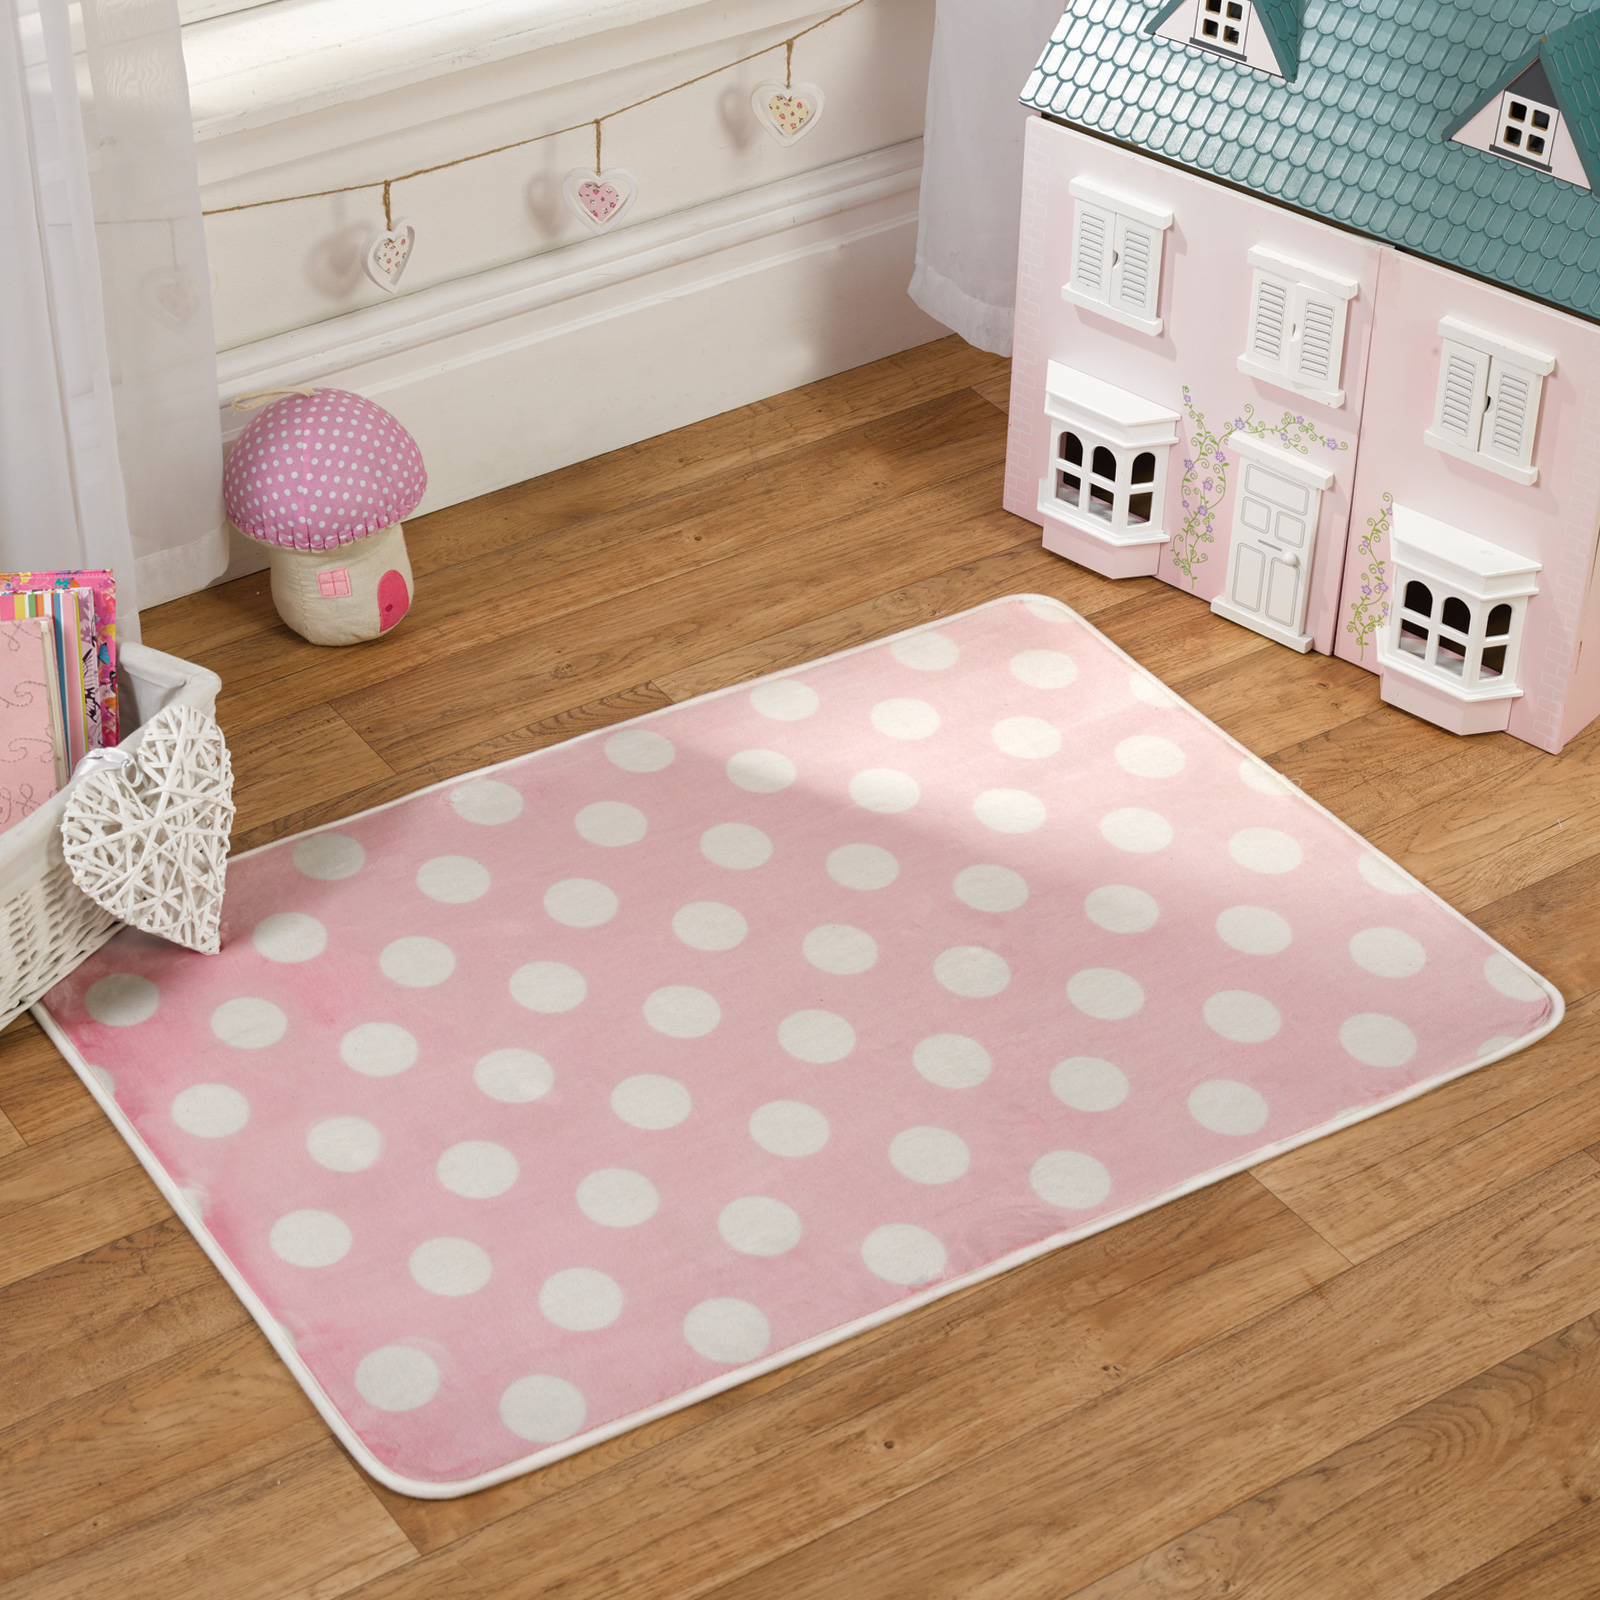 Pastel Rugs Baby Room: Childrens Pastel Print Nursery Rug With Super Soft Pile